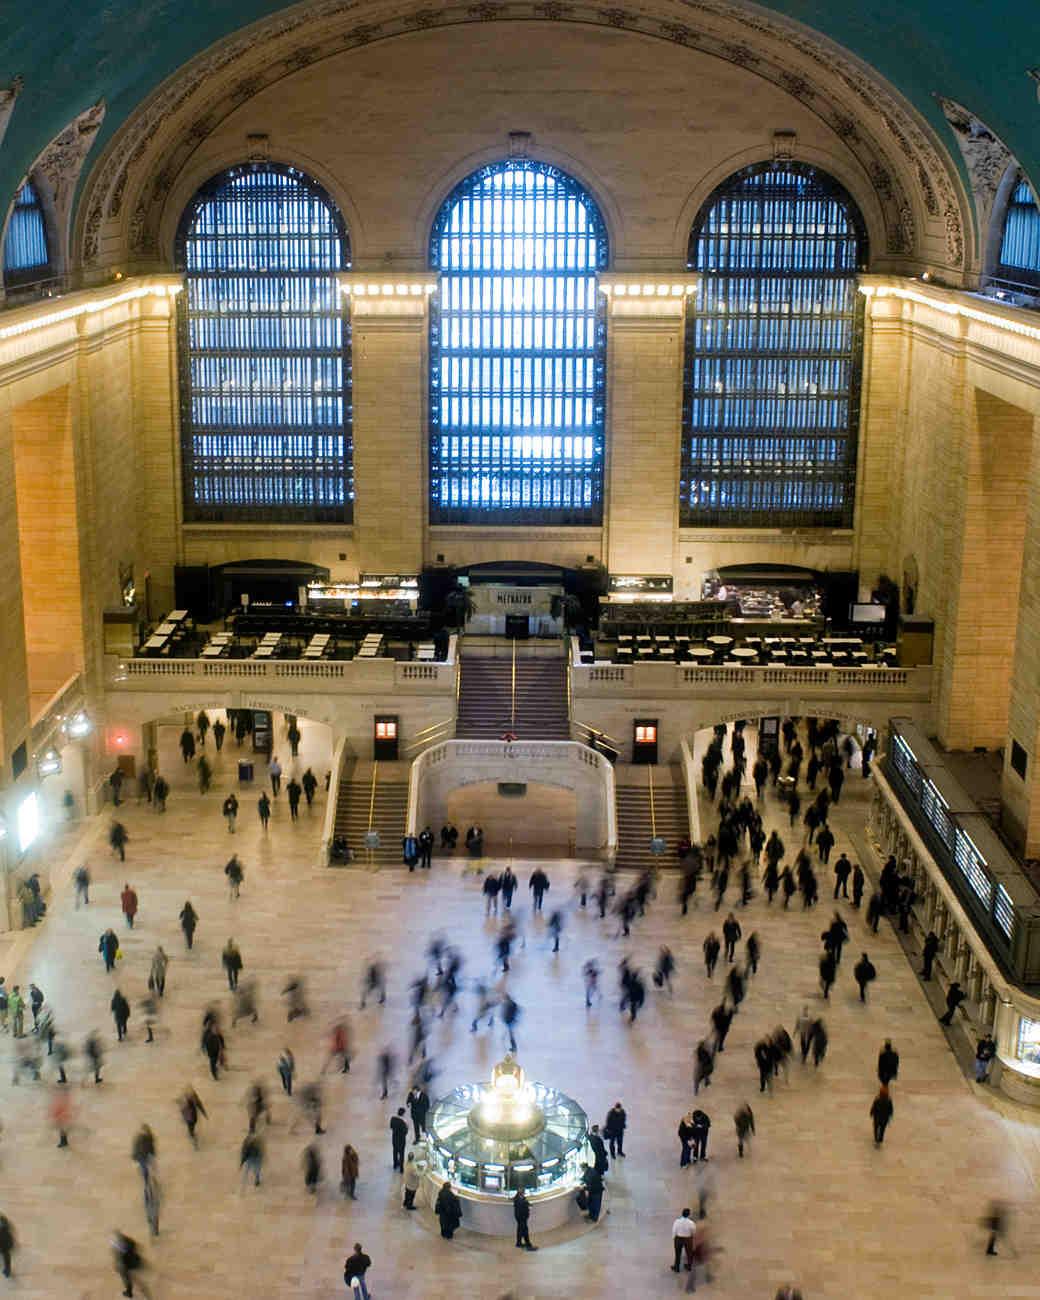 Station Train Grand Central Schedule